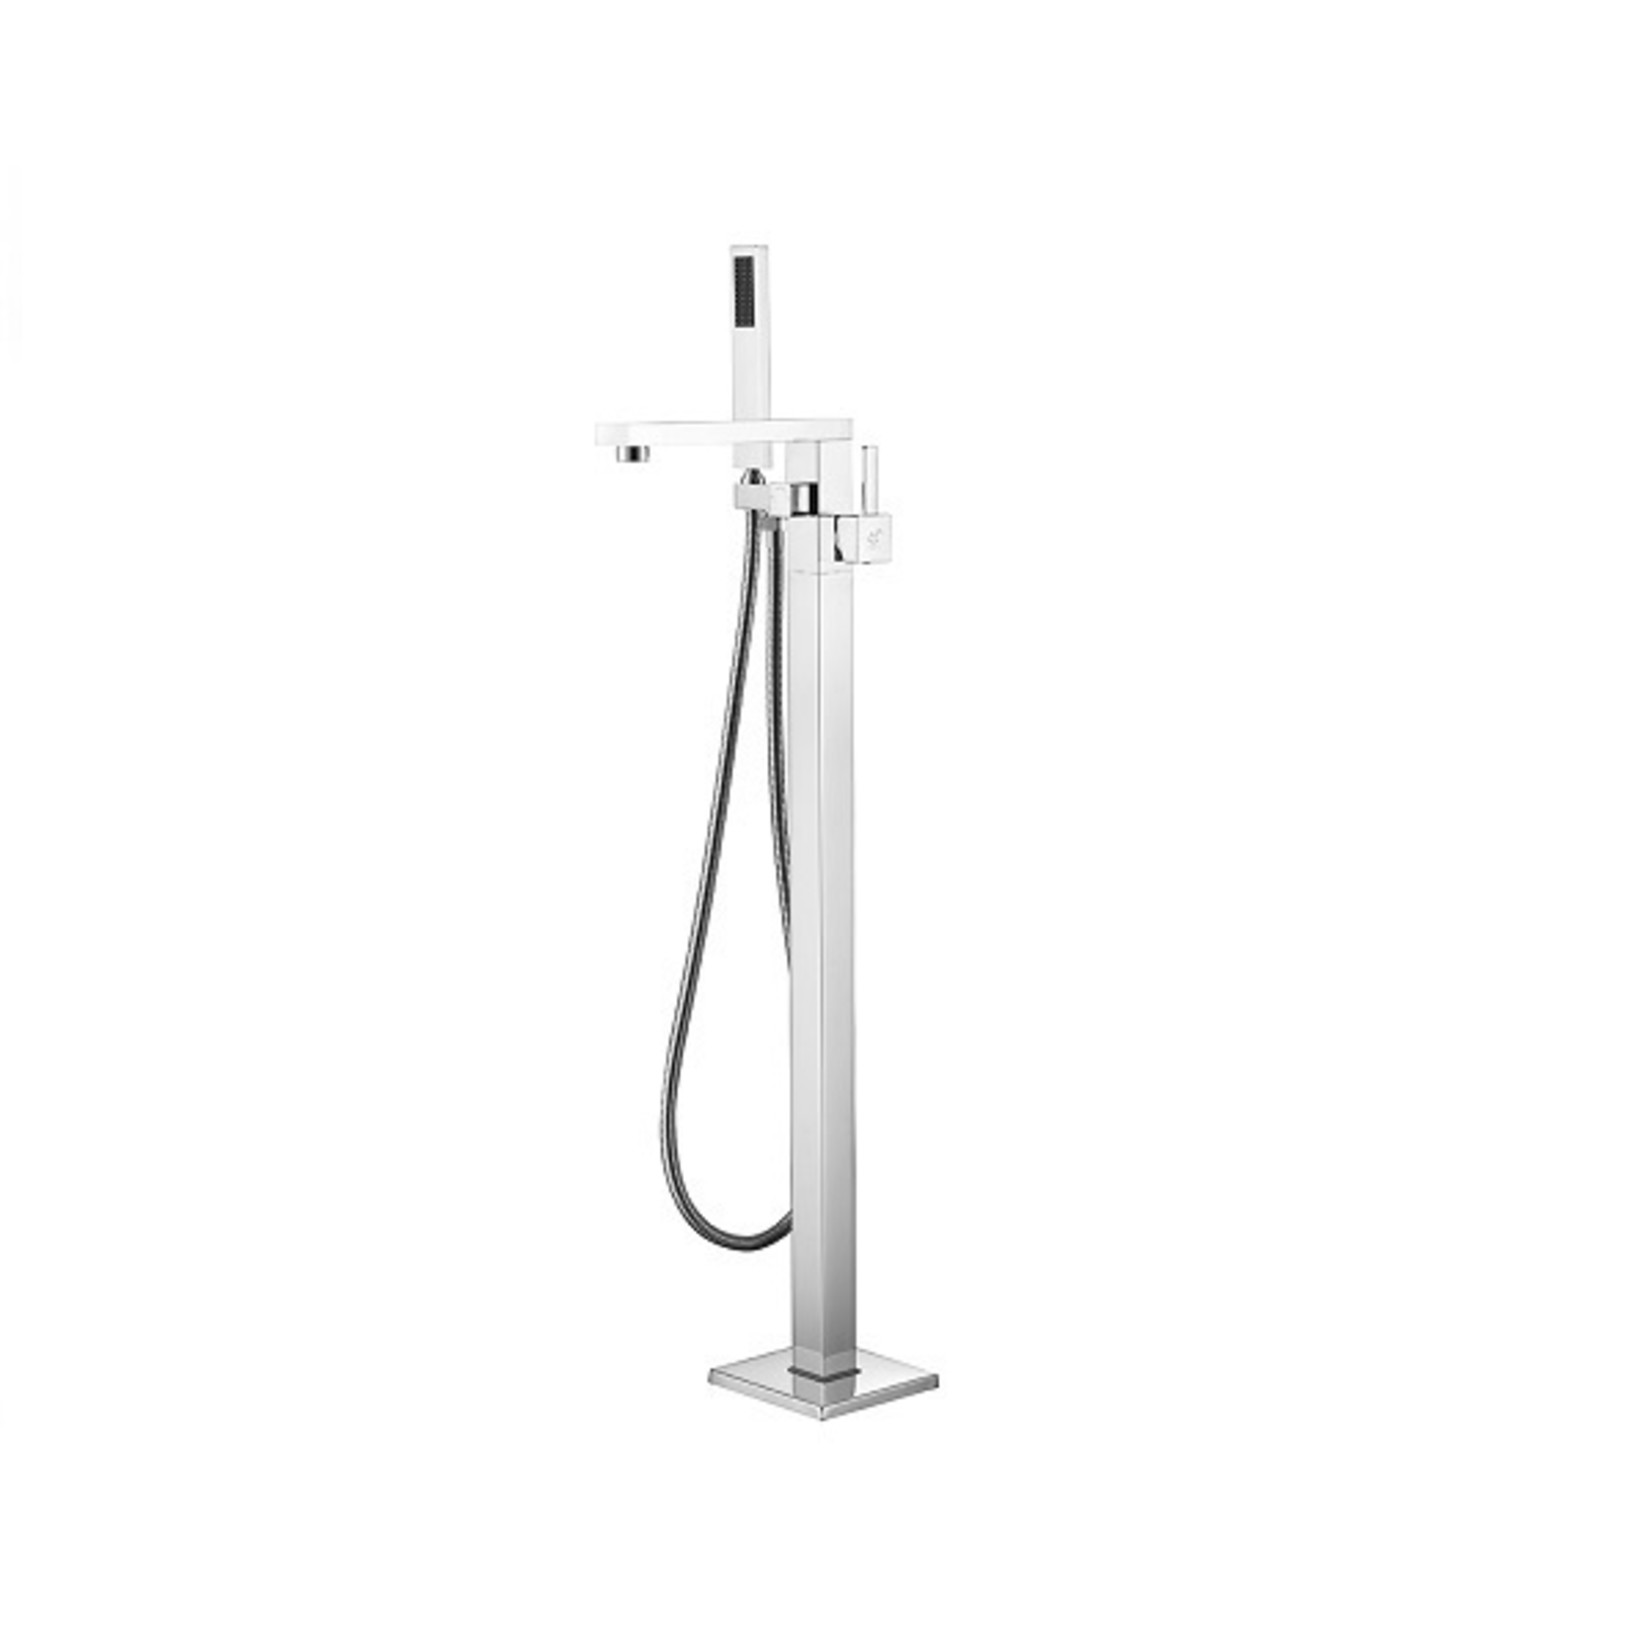 Freestanding bath faucet 3824 Chrome